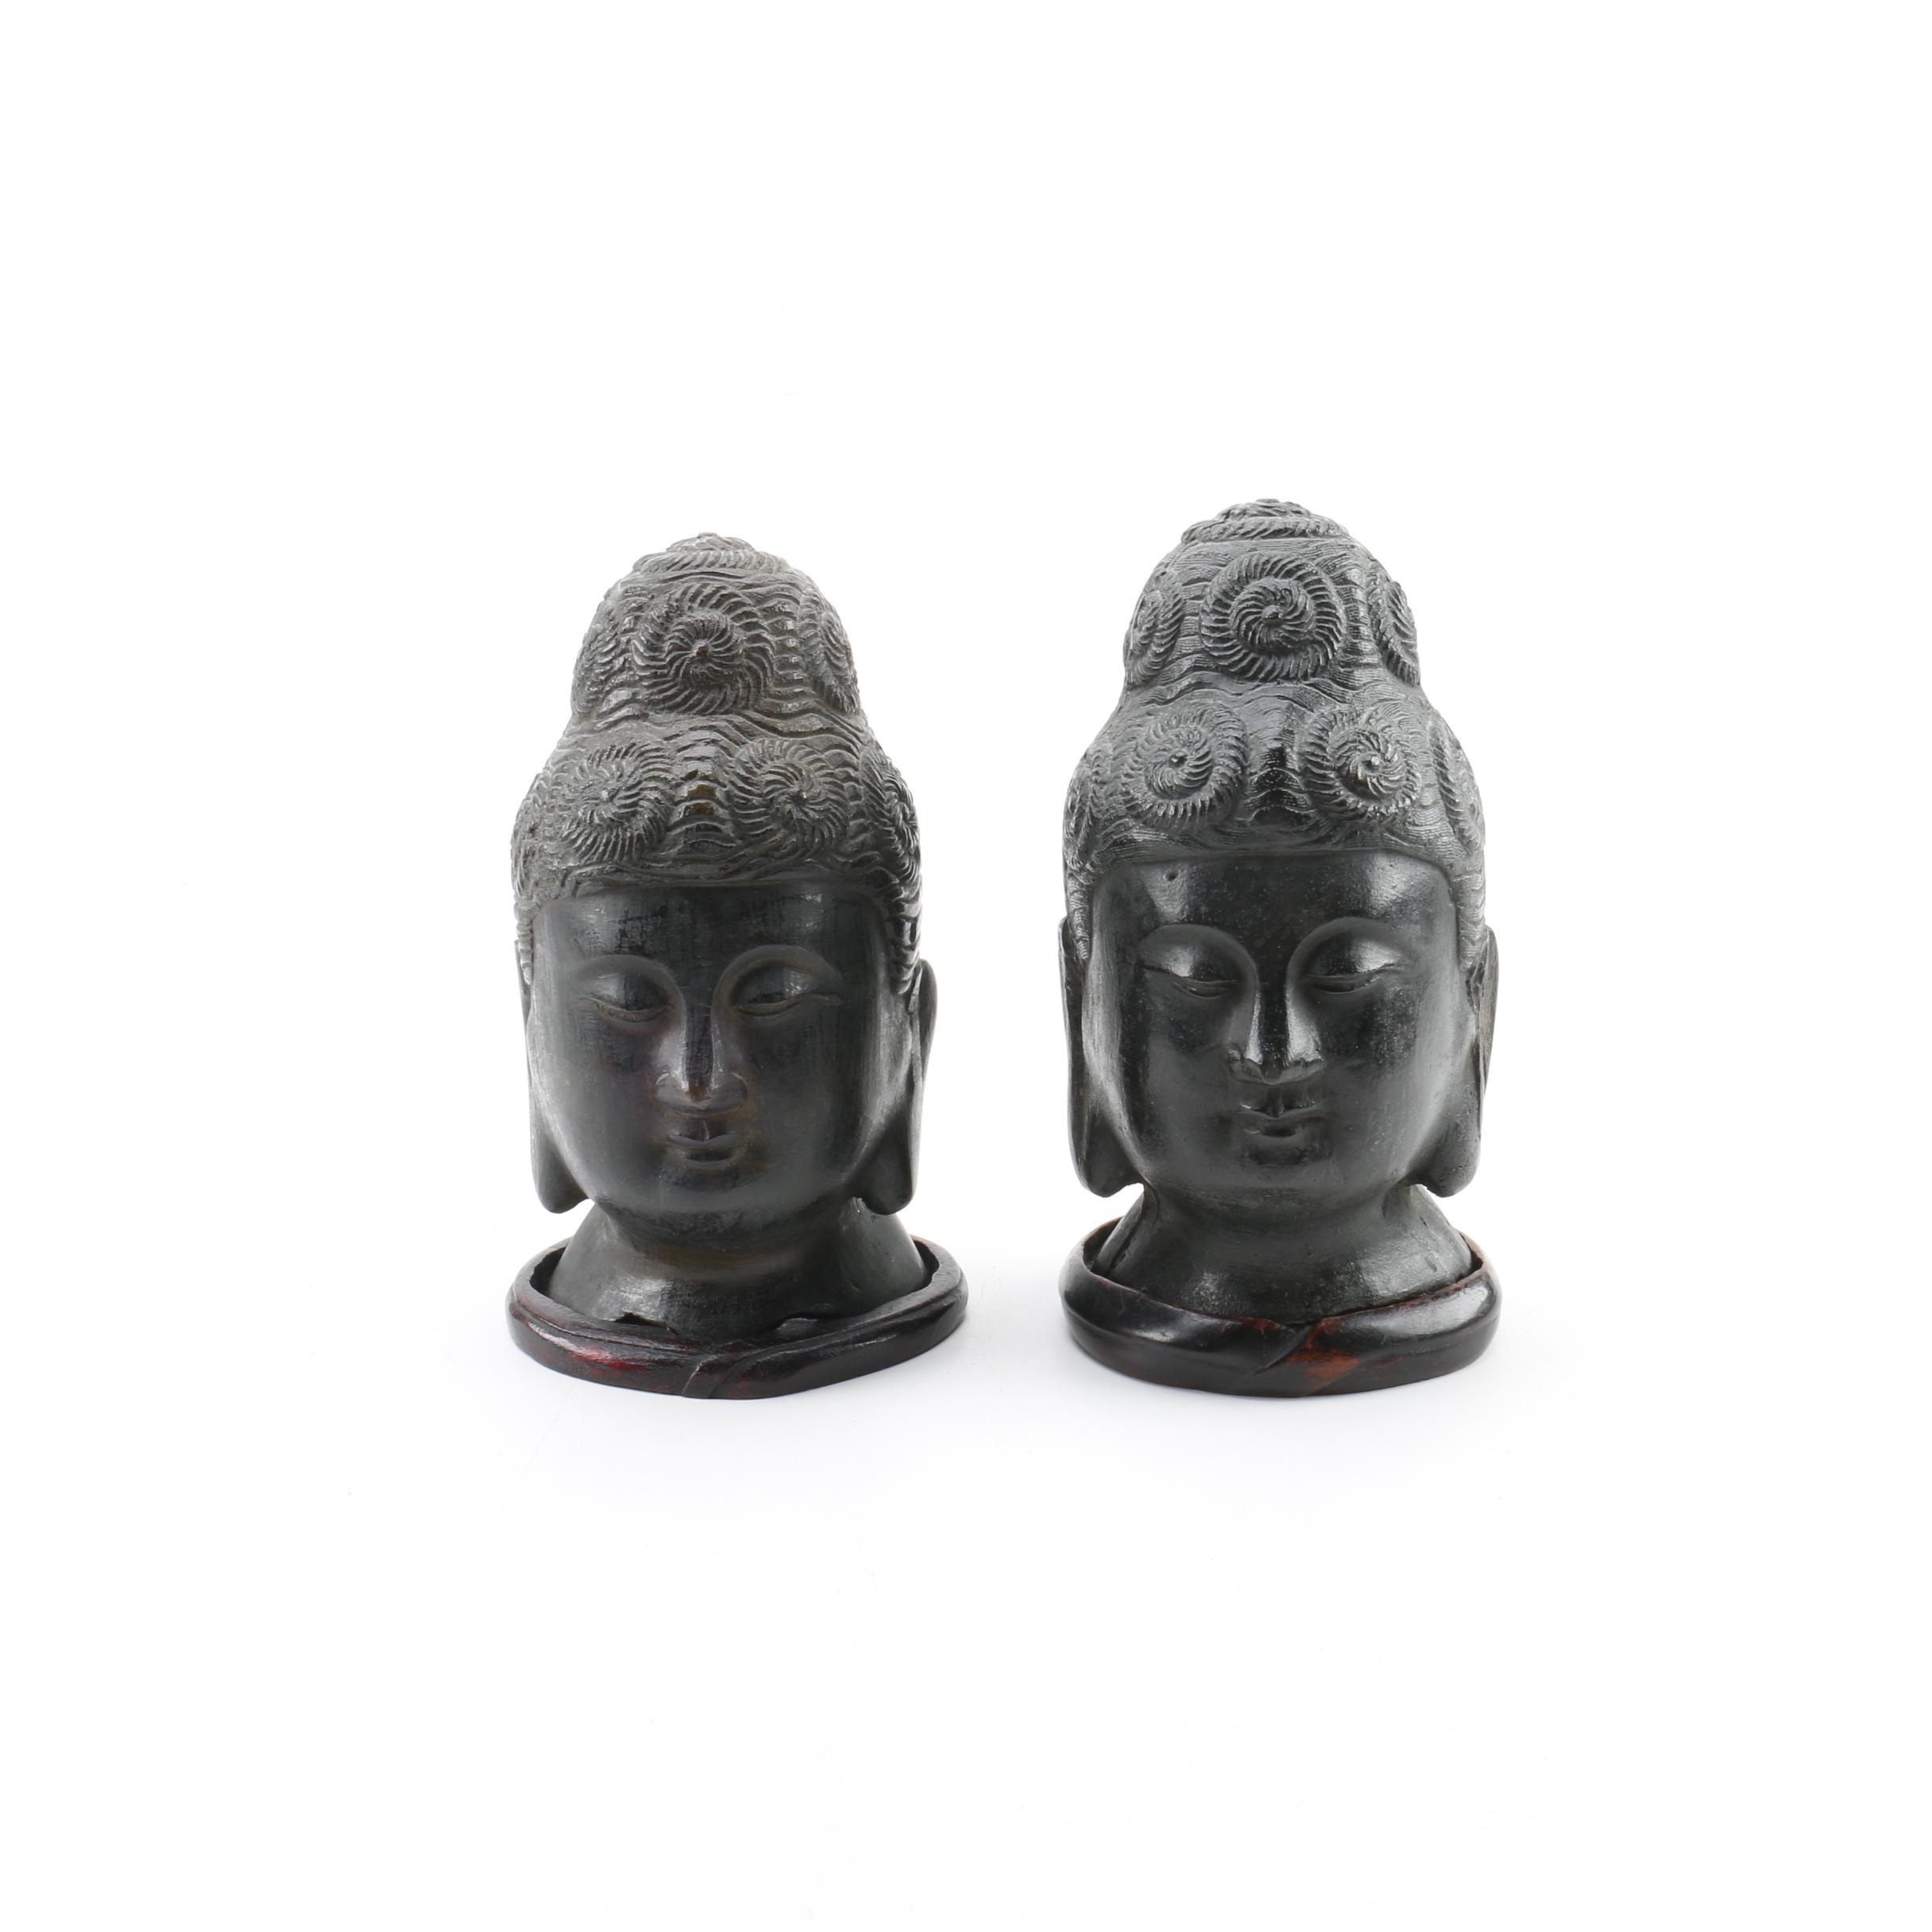 Chinese Buddhist Bust Figurines